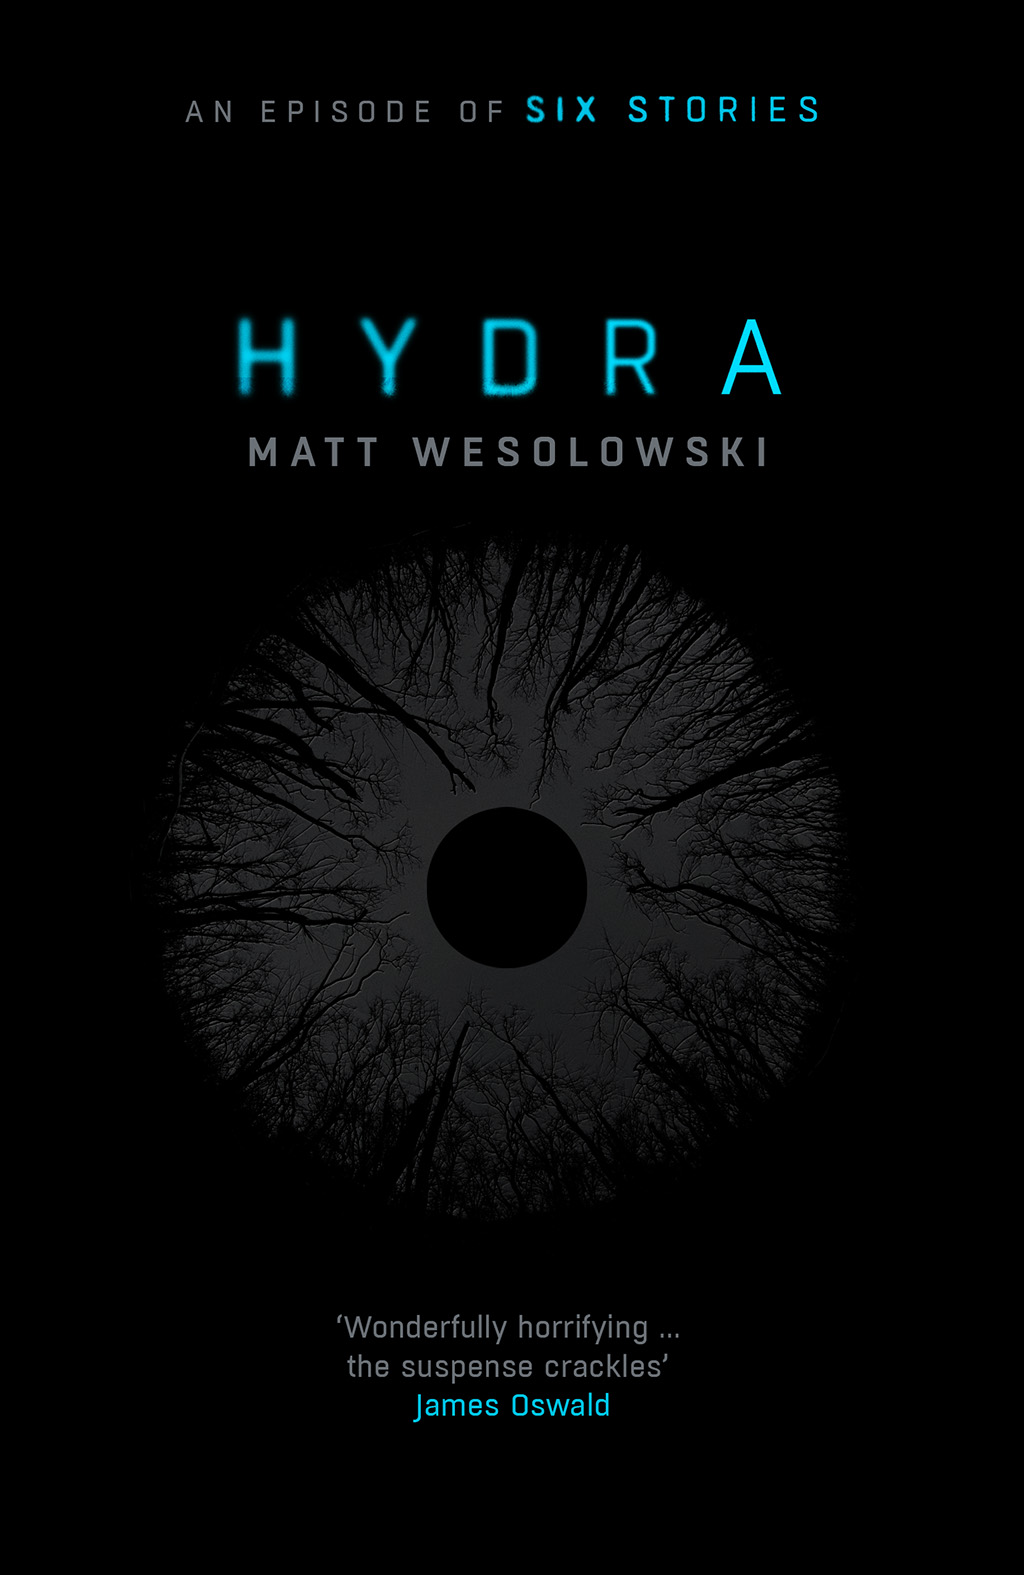 HYDRA VIS 1.jpg